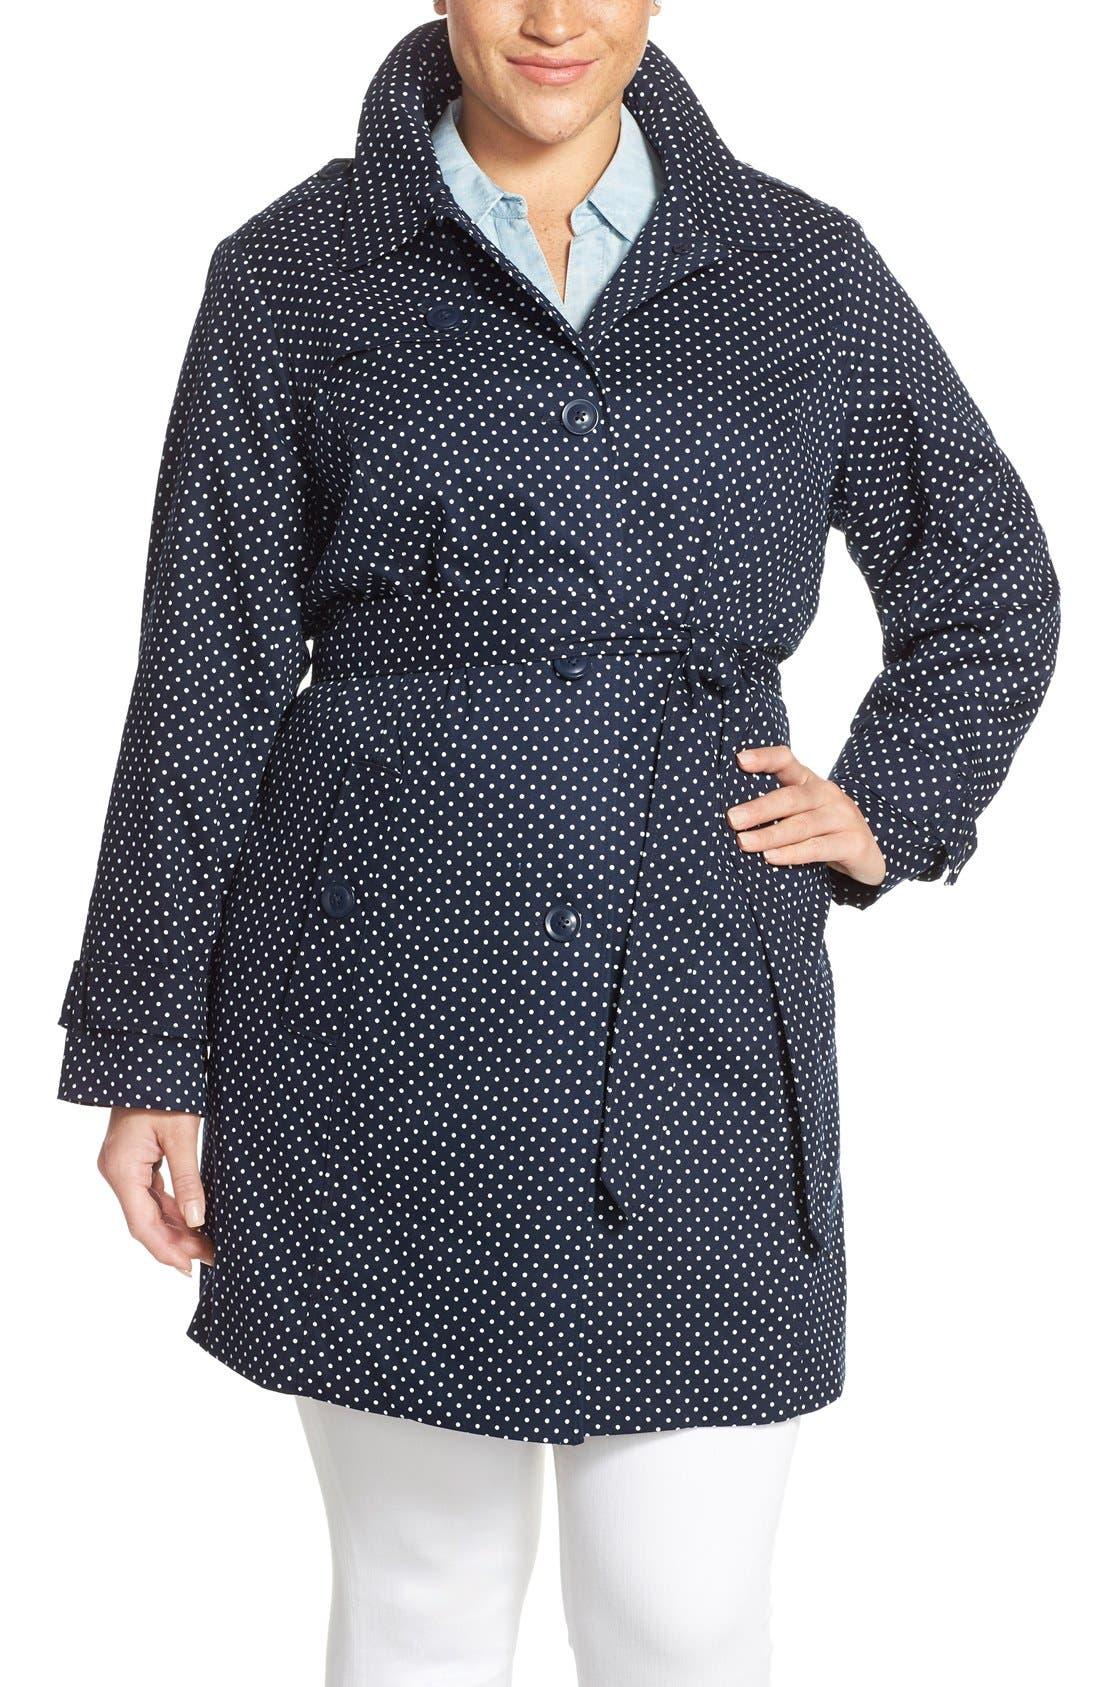 Main Image - London Fog Polka Dot Single Breasted Trench Coat (Plus Size)